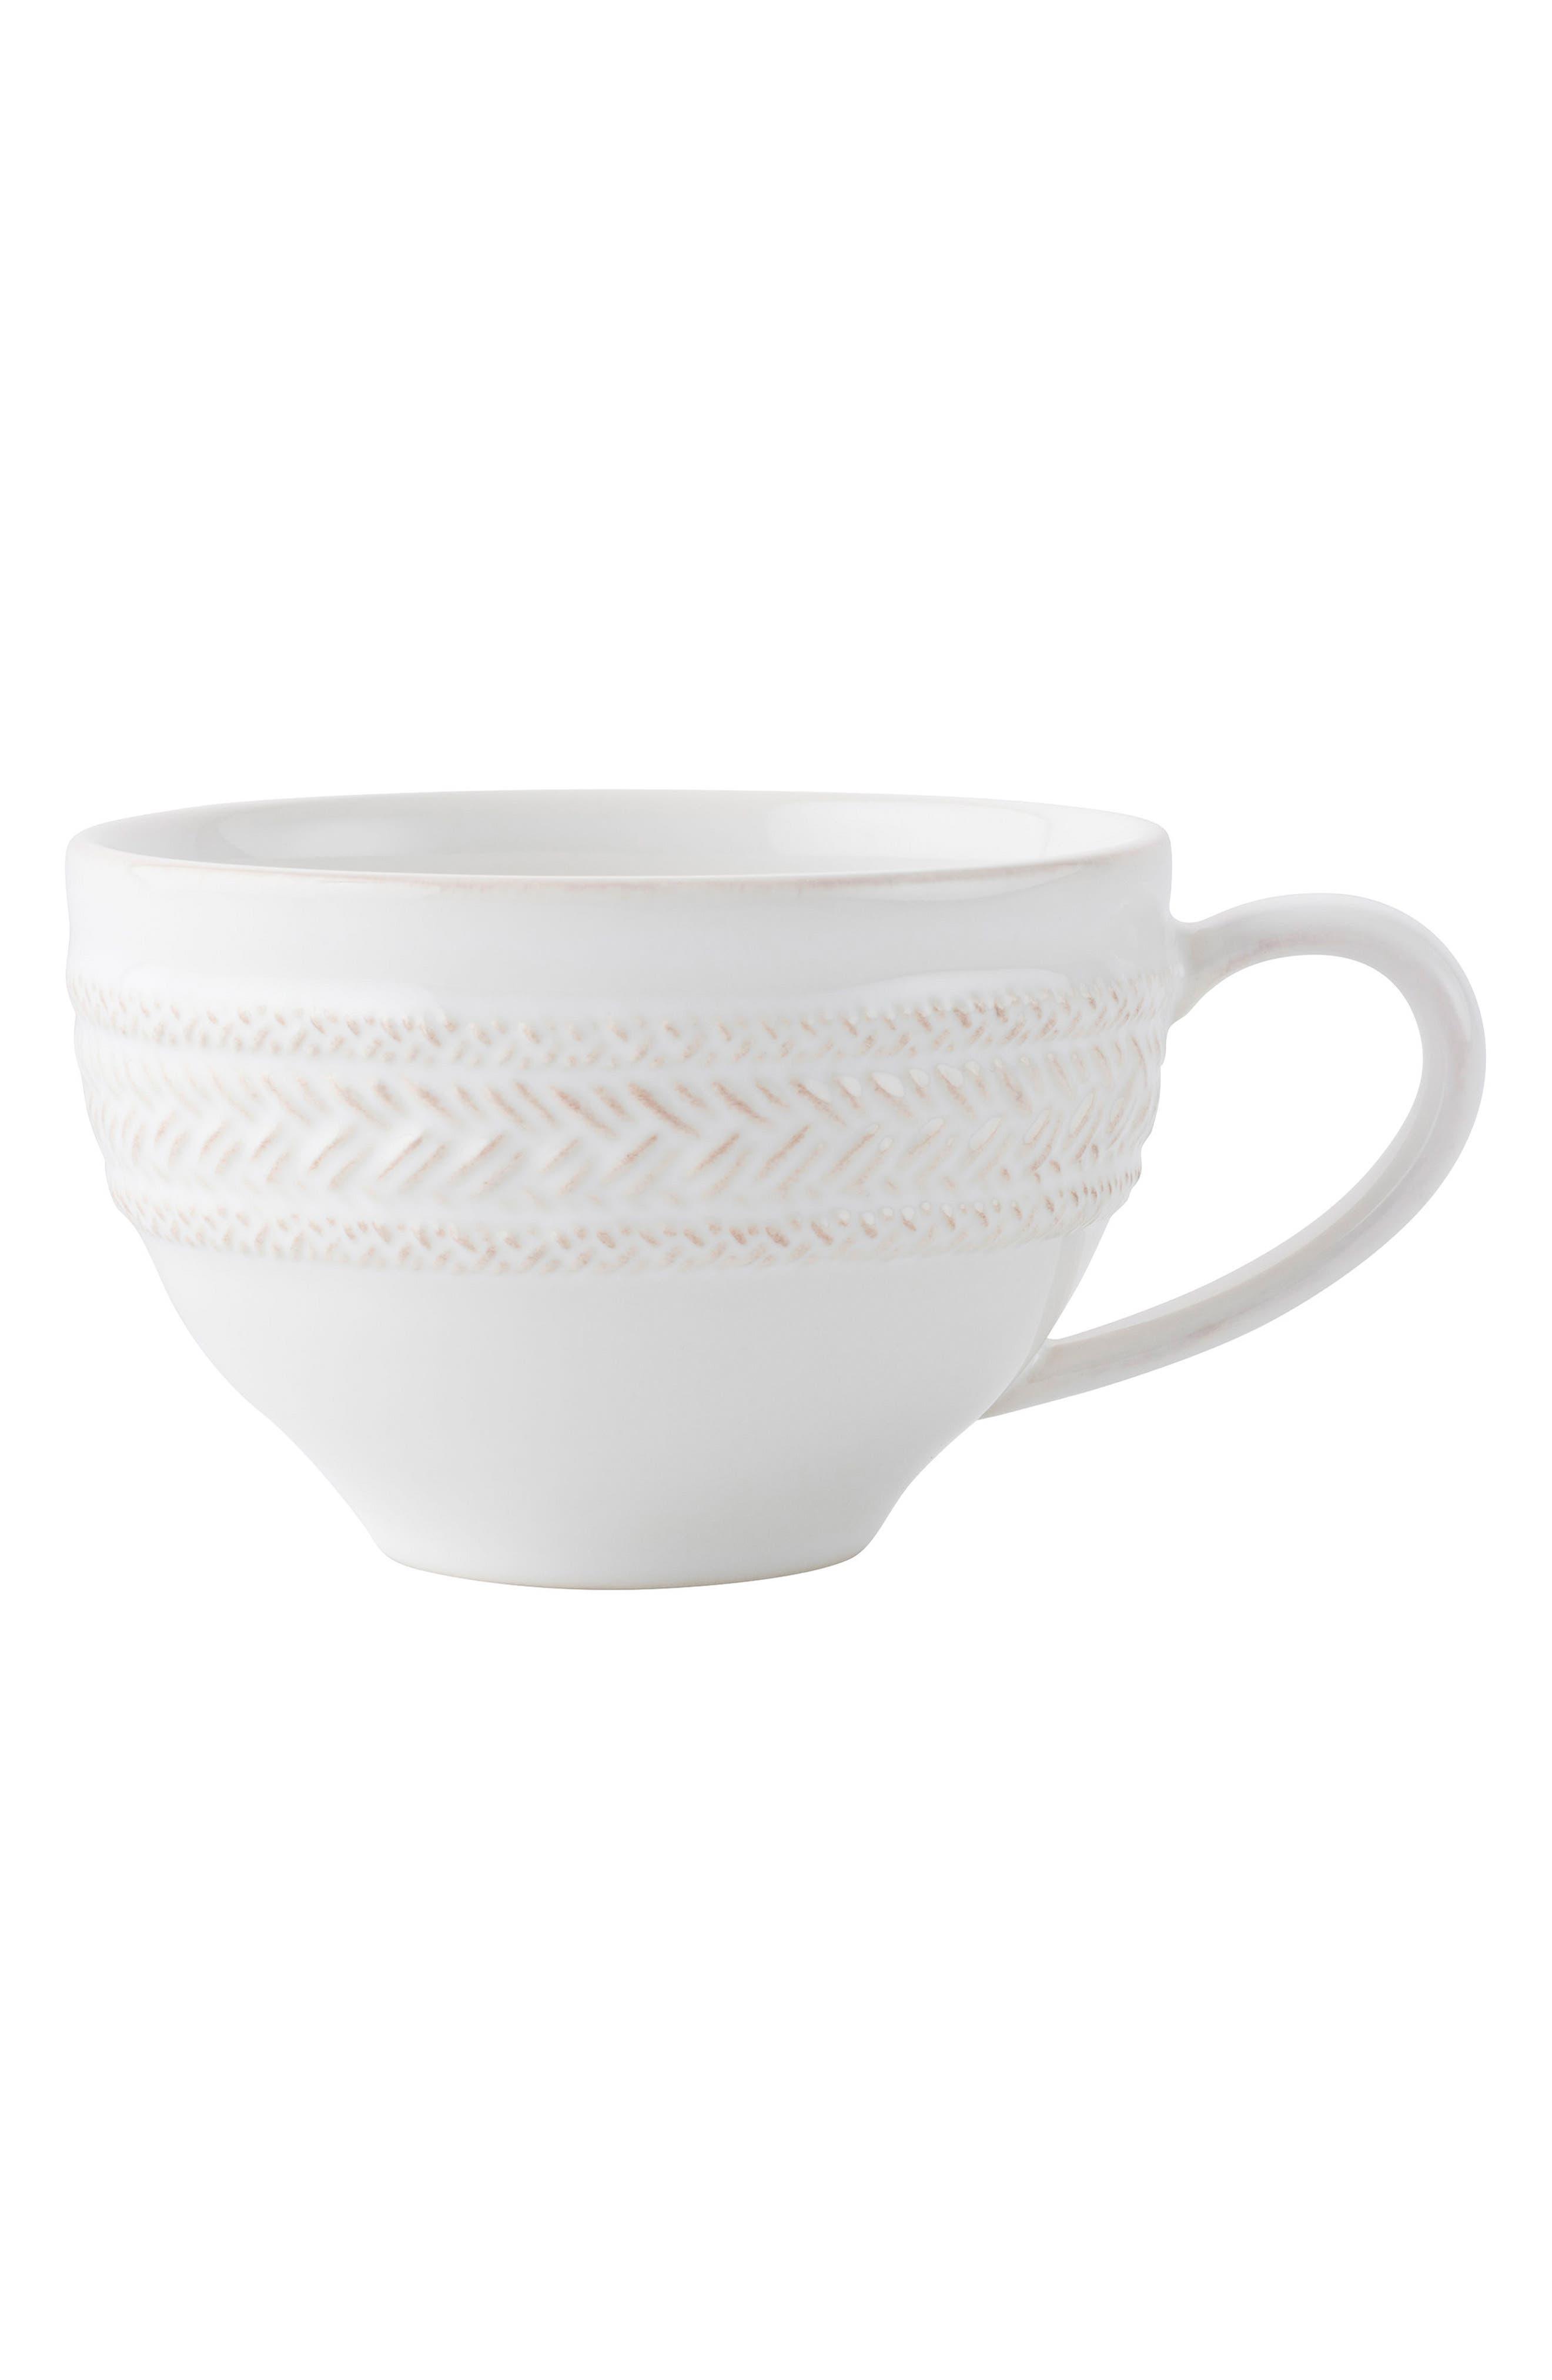 Le Panier Whitewash Coffee Cup,                             Main thumbnail 1, color,                             Whitewash